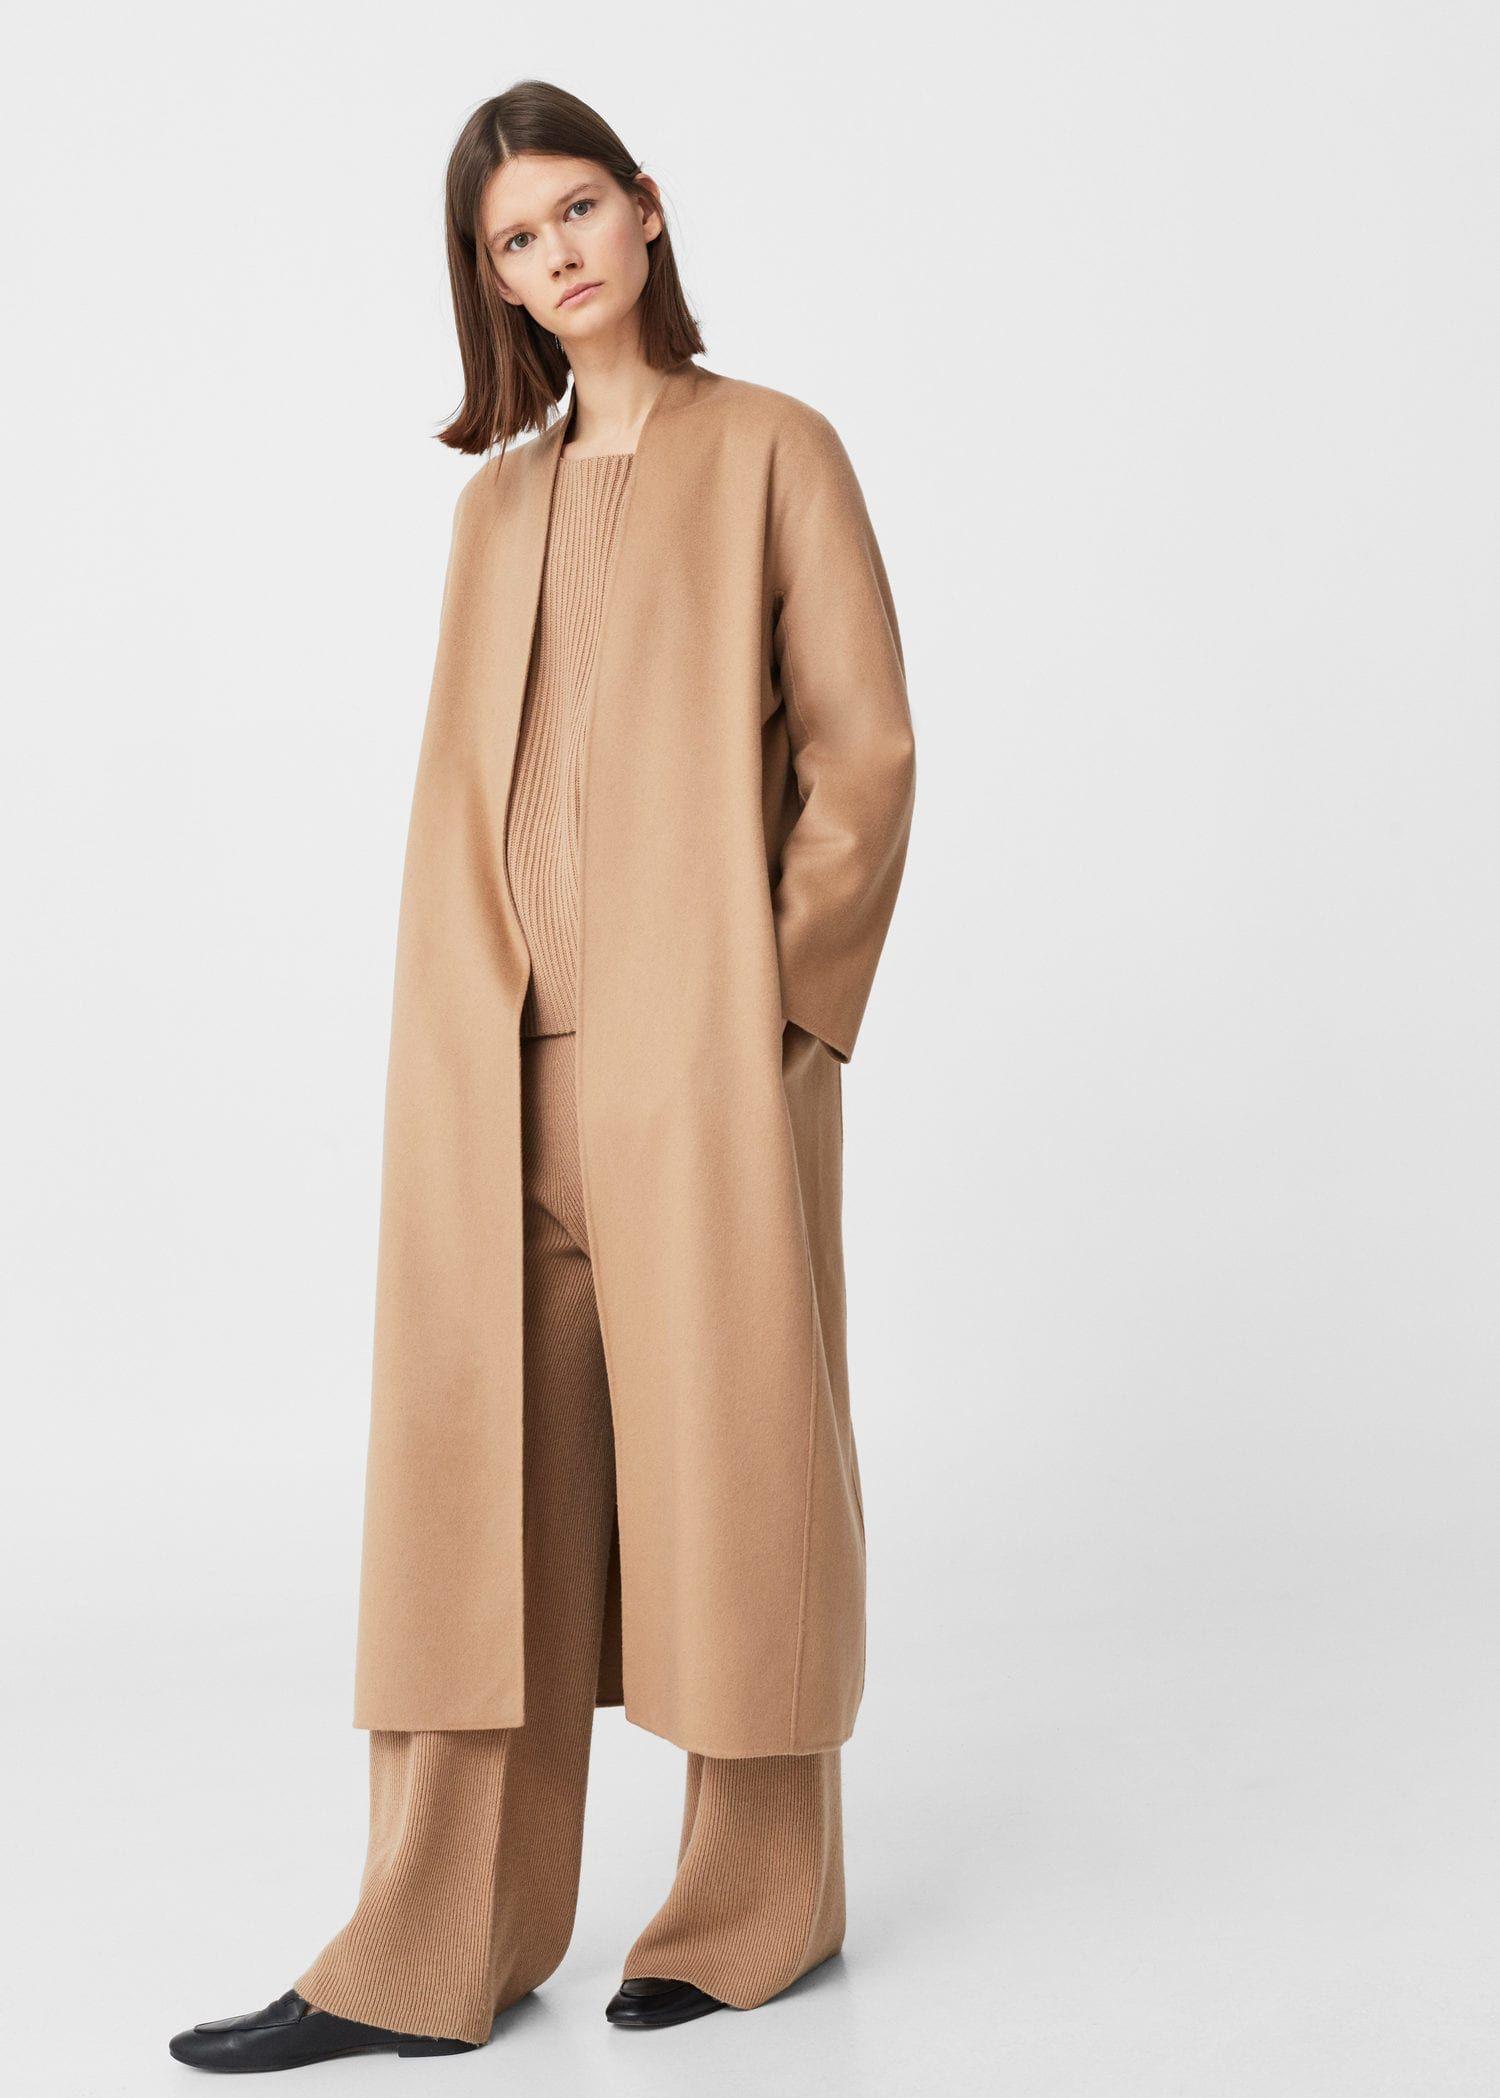 Mantel Aus 100 Kaschmir Damen Mango Deutschland Kaschmir Mantel Mantel Frauen Kaschmir